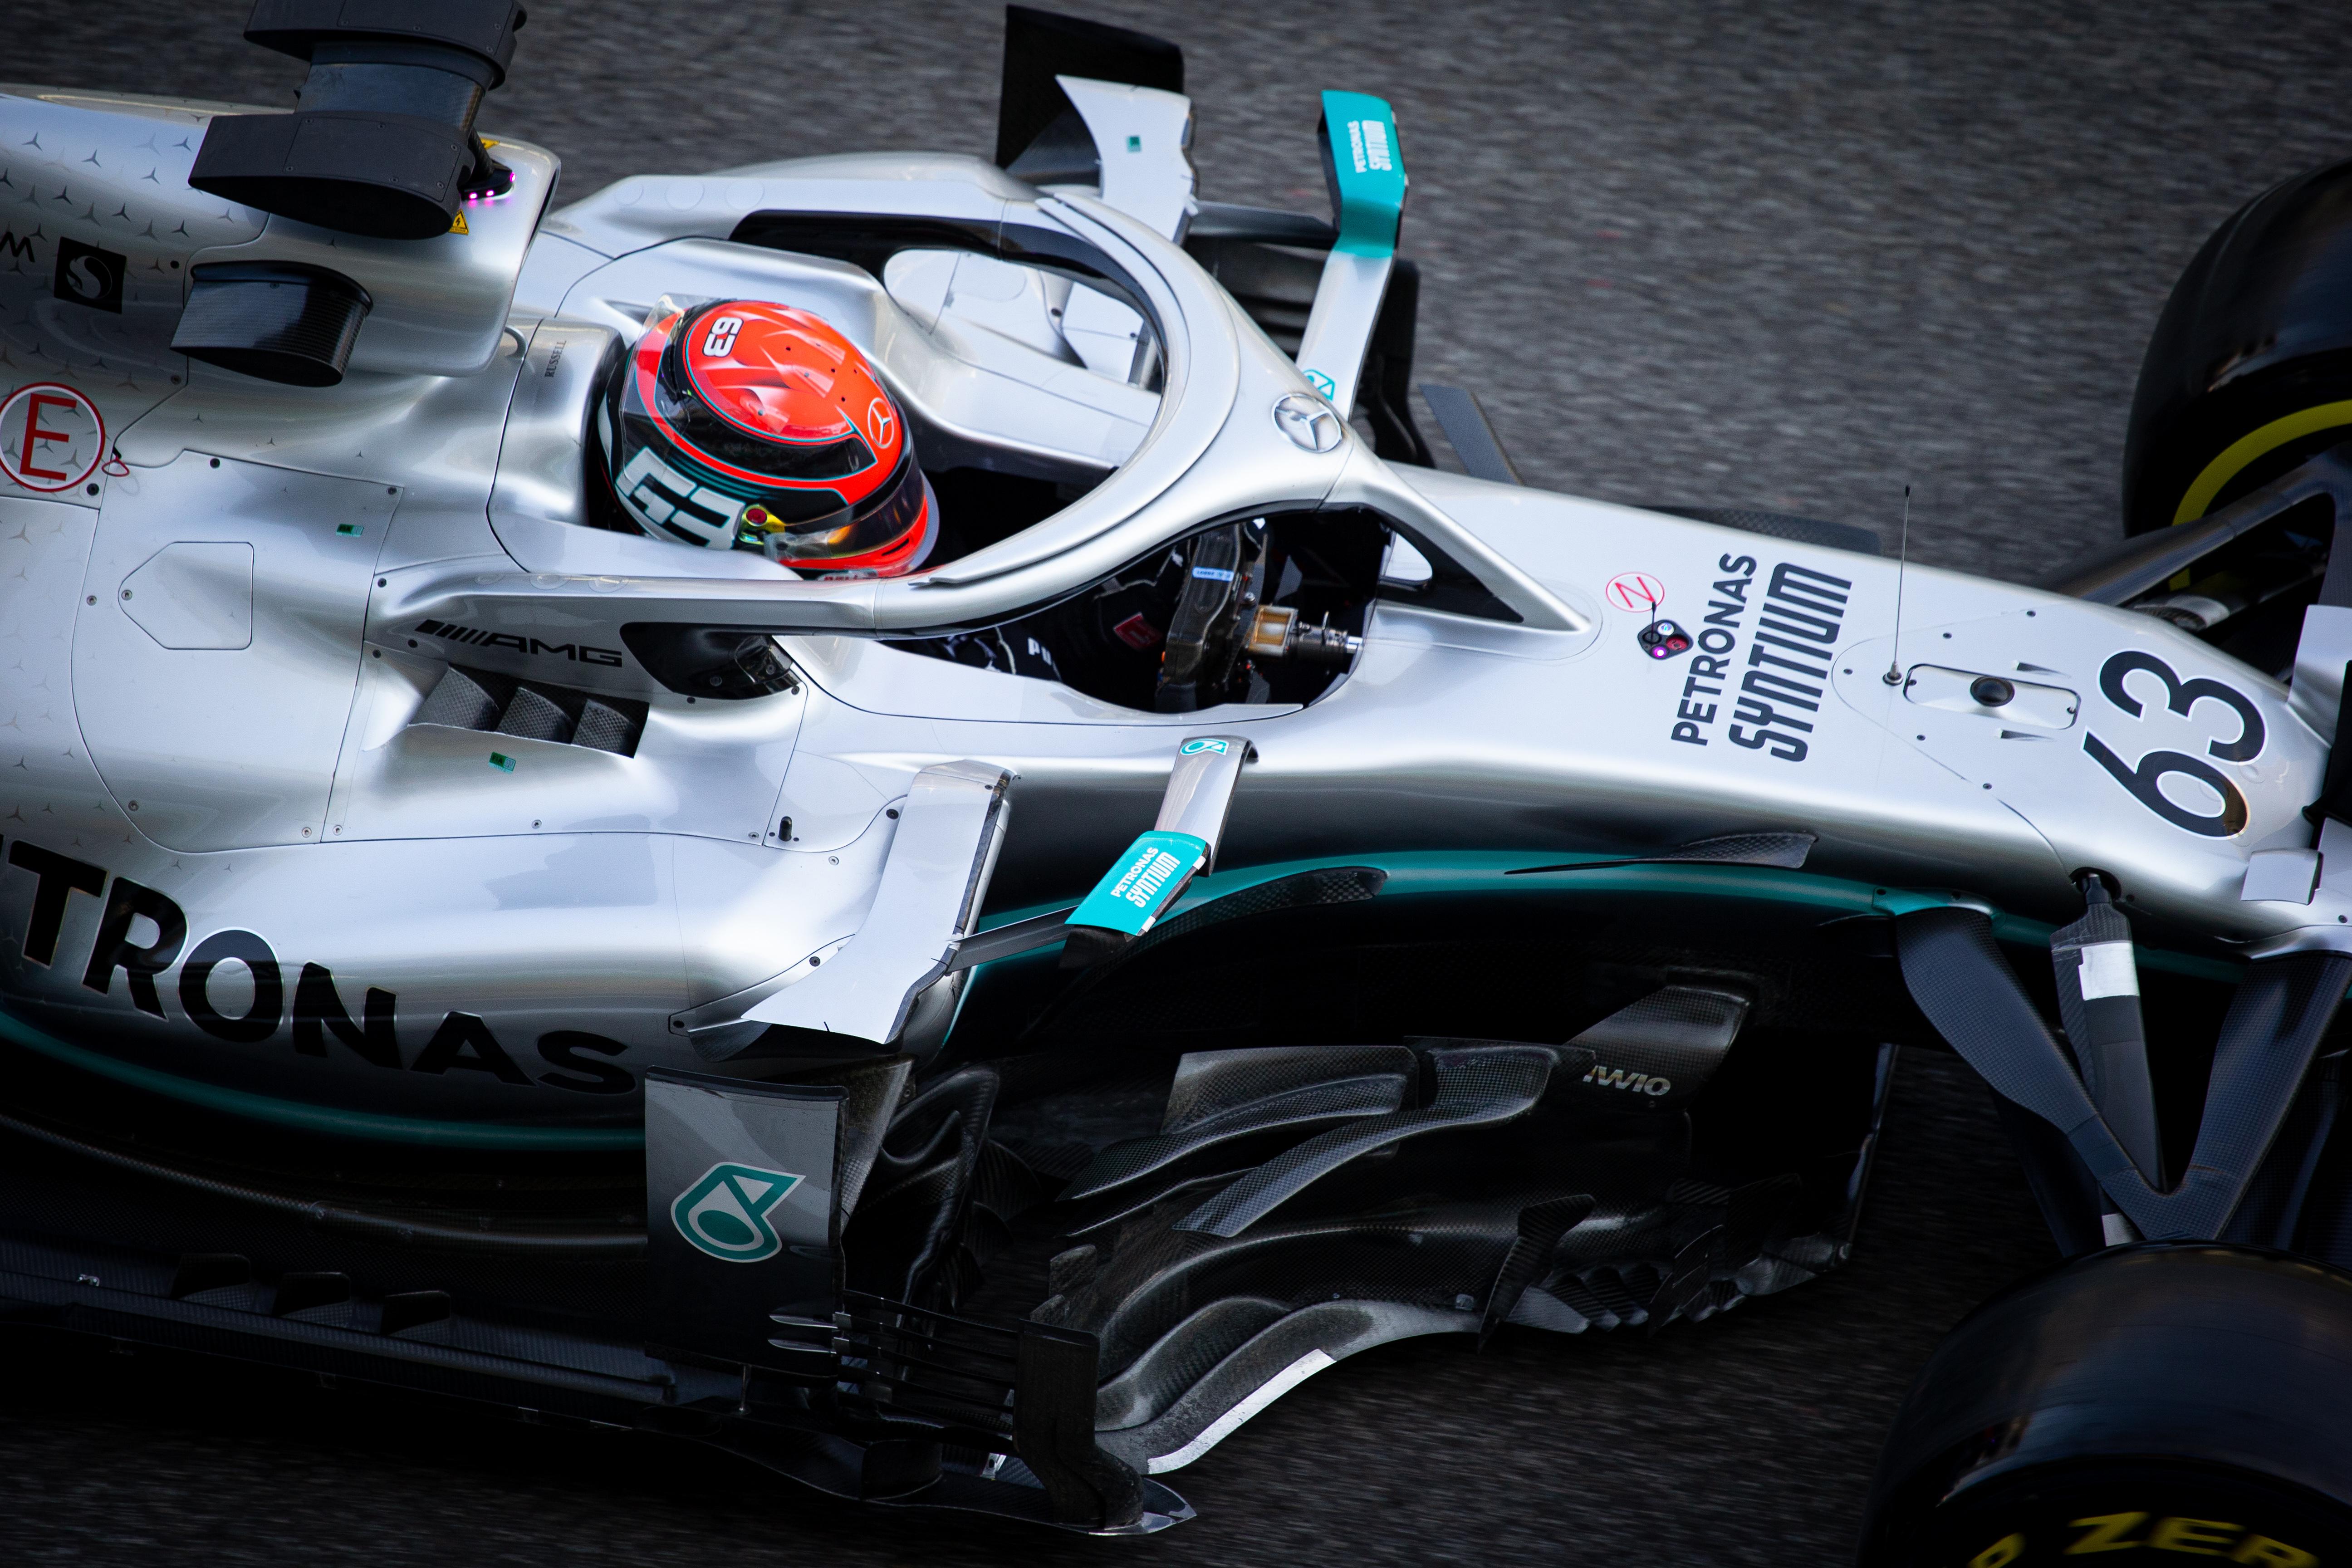 George Russell Mercedes F1 Abu Dhabi test 2019